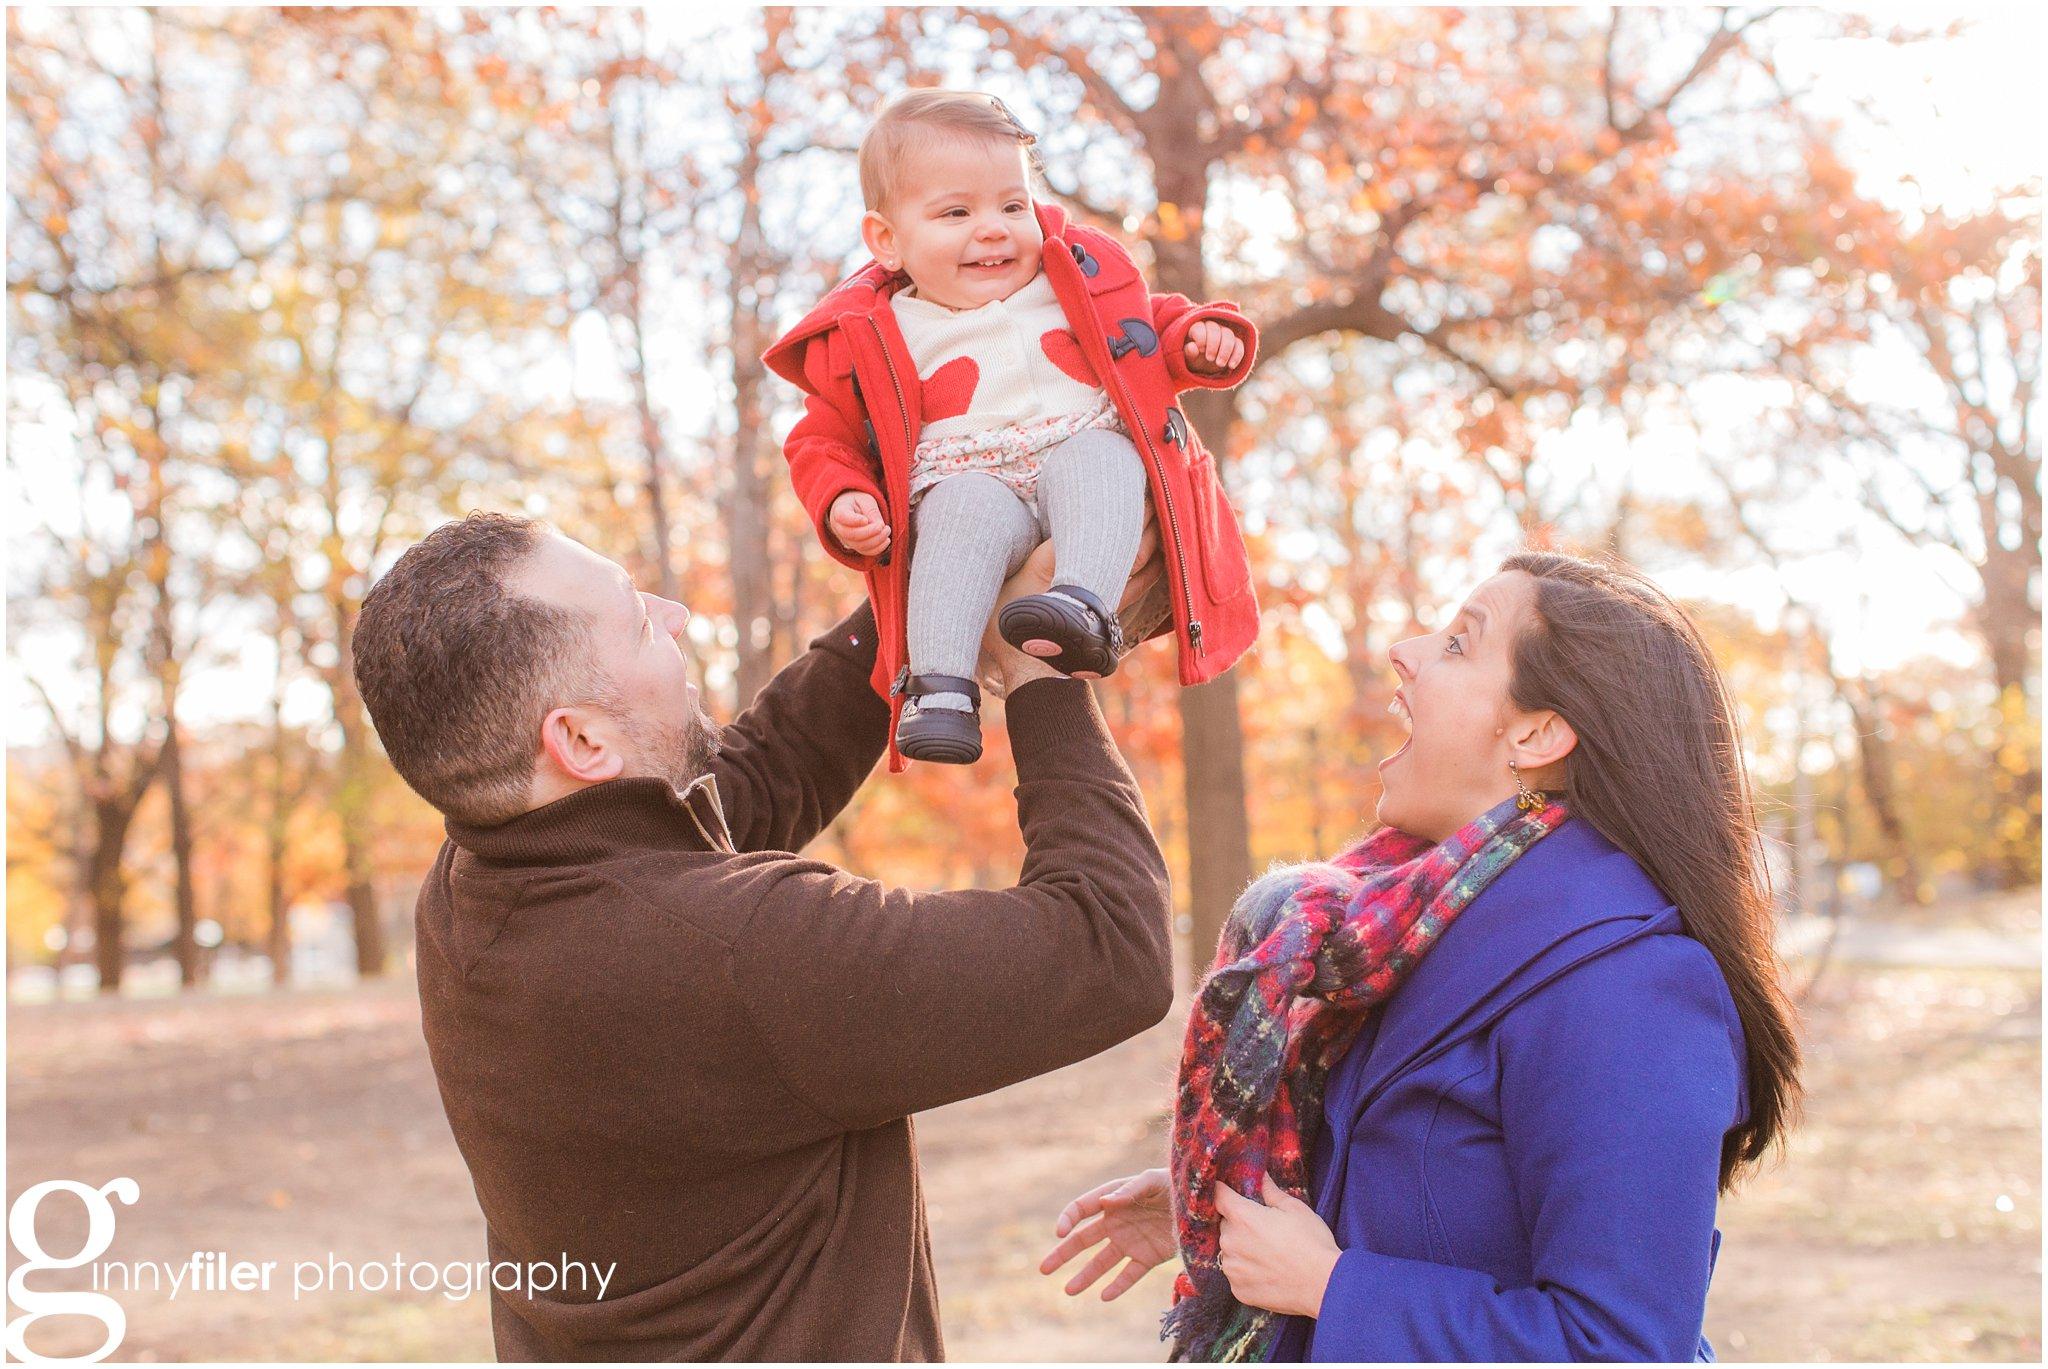 family_photography_Sanchez_0010.jpg